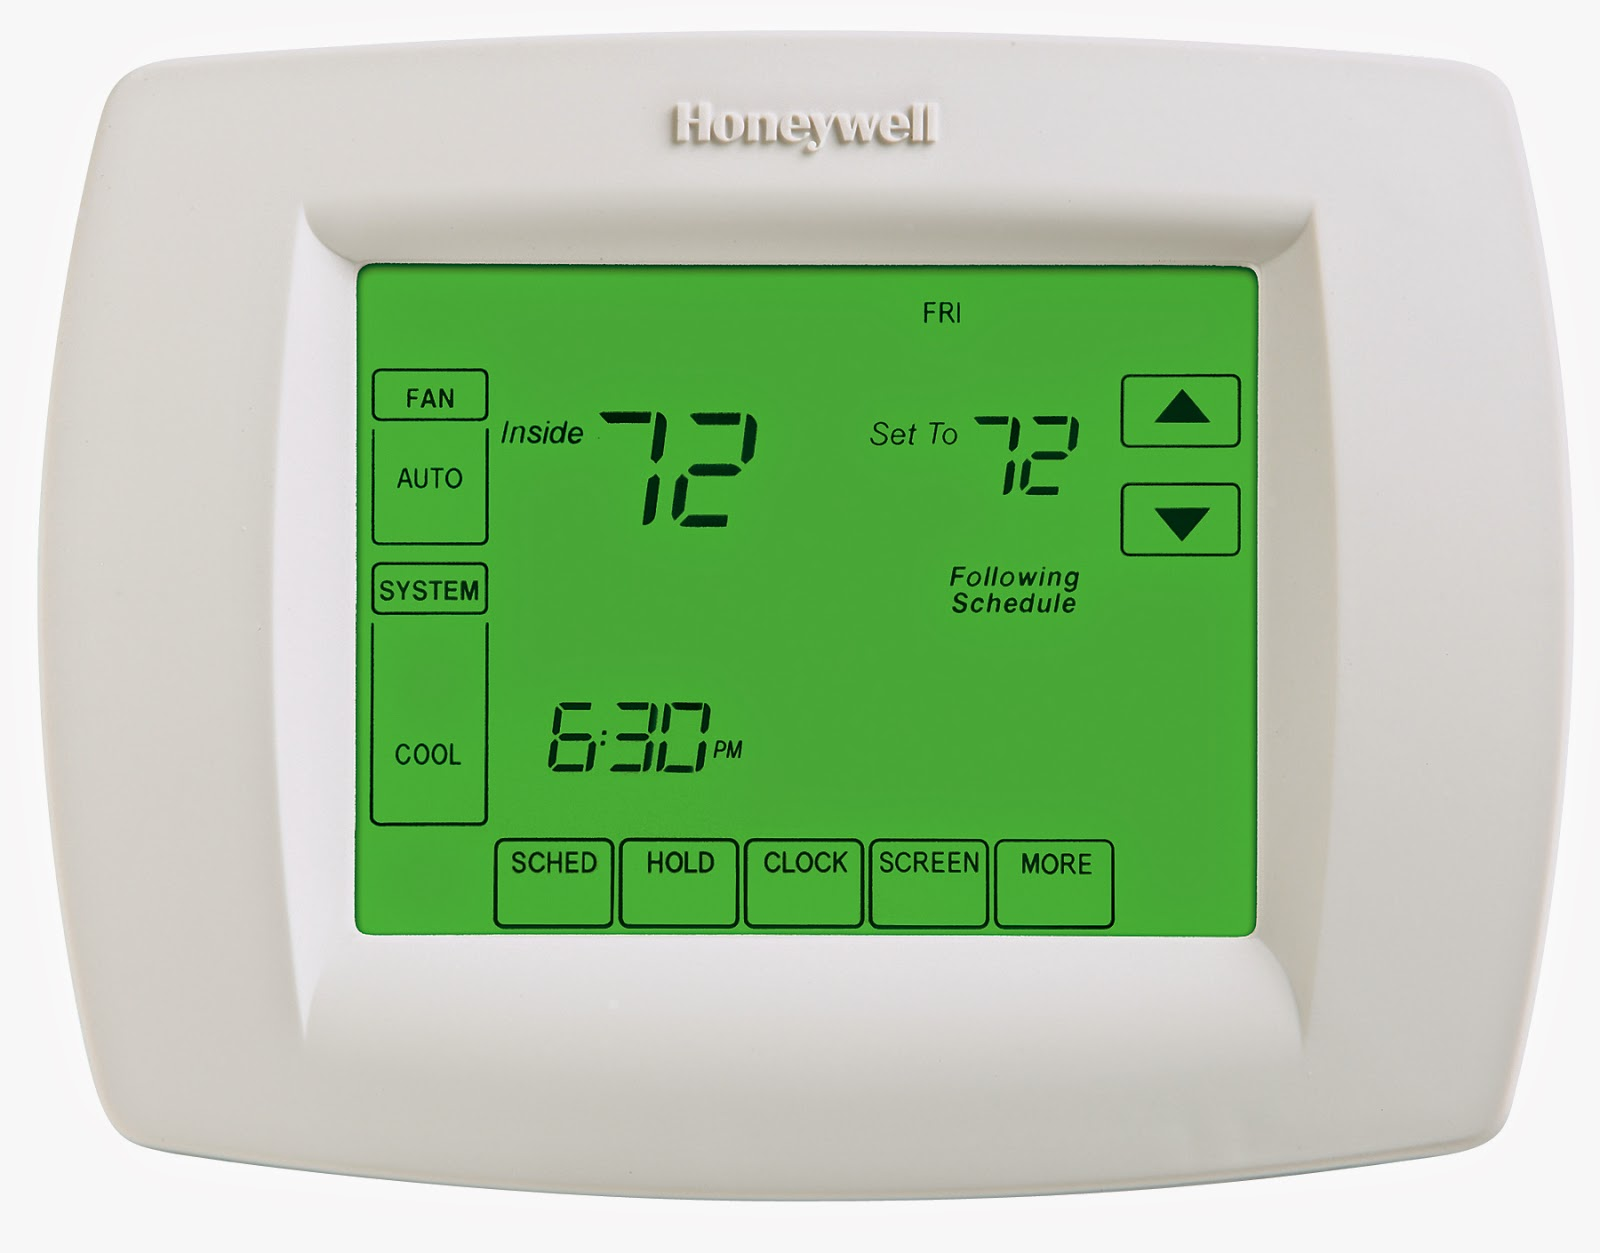 honeywell thermostat setup instructions